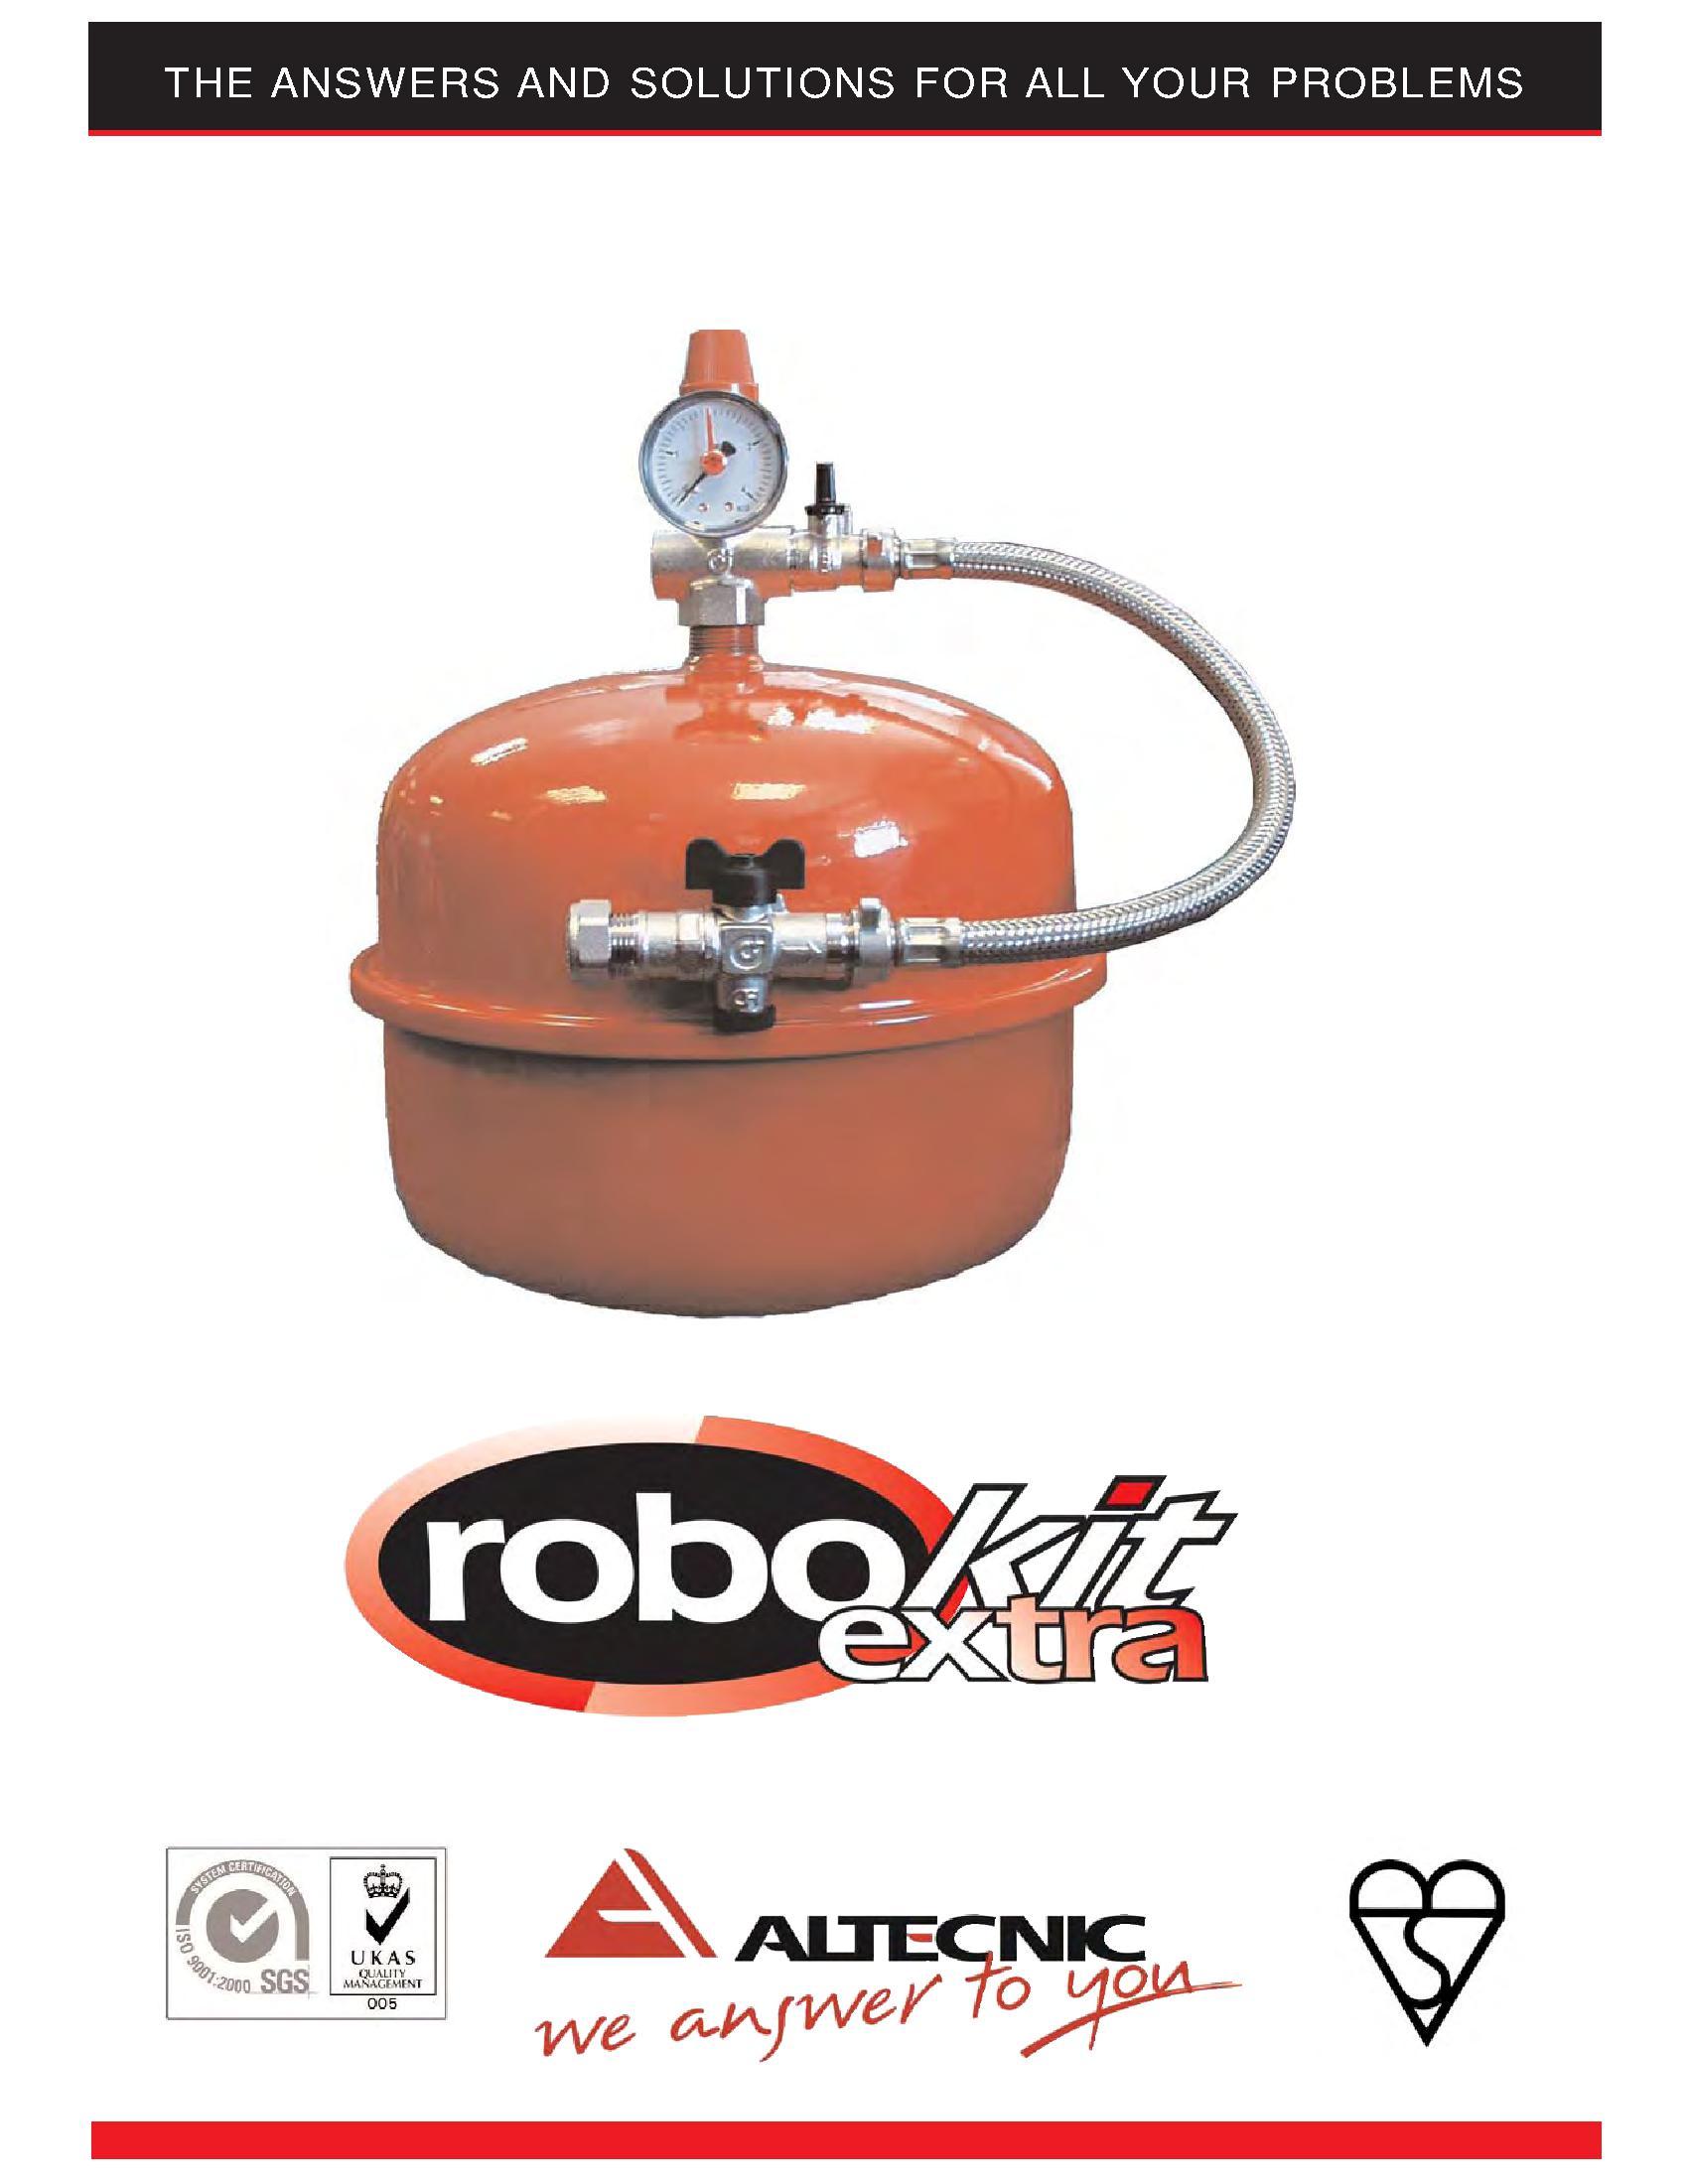 Altecnic Er-Ecokit Sealed System Kit Robo PDF